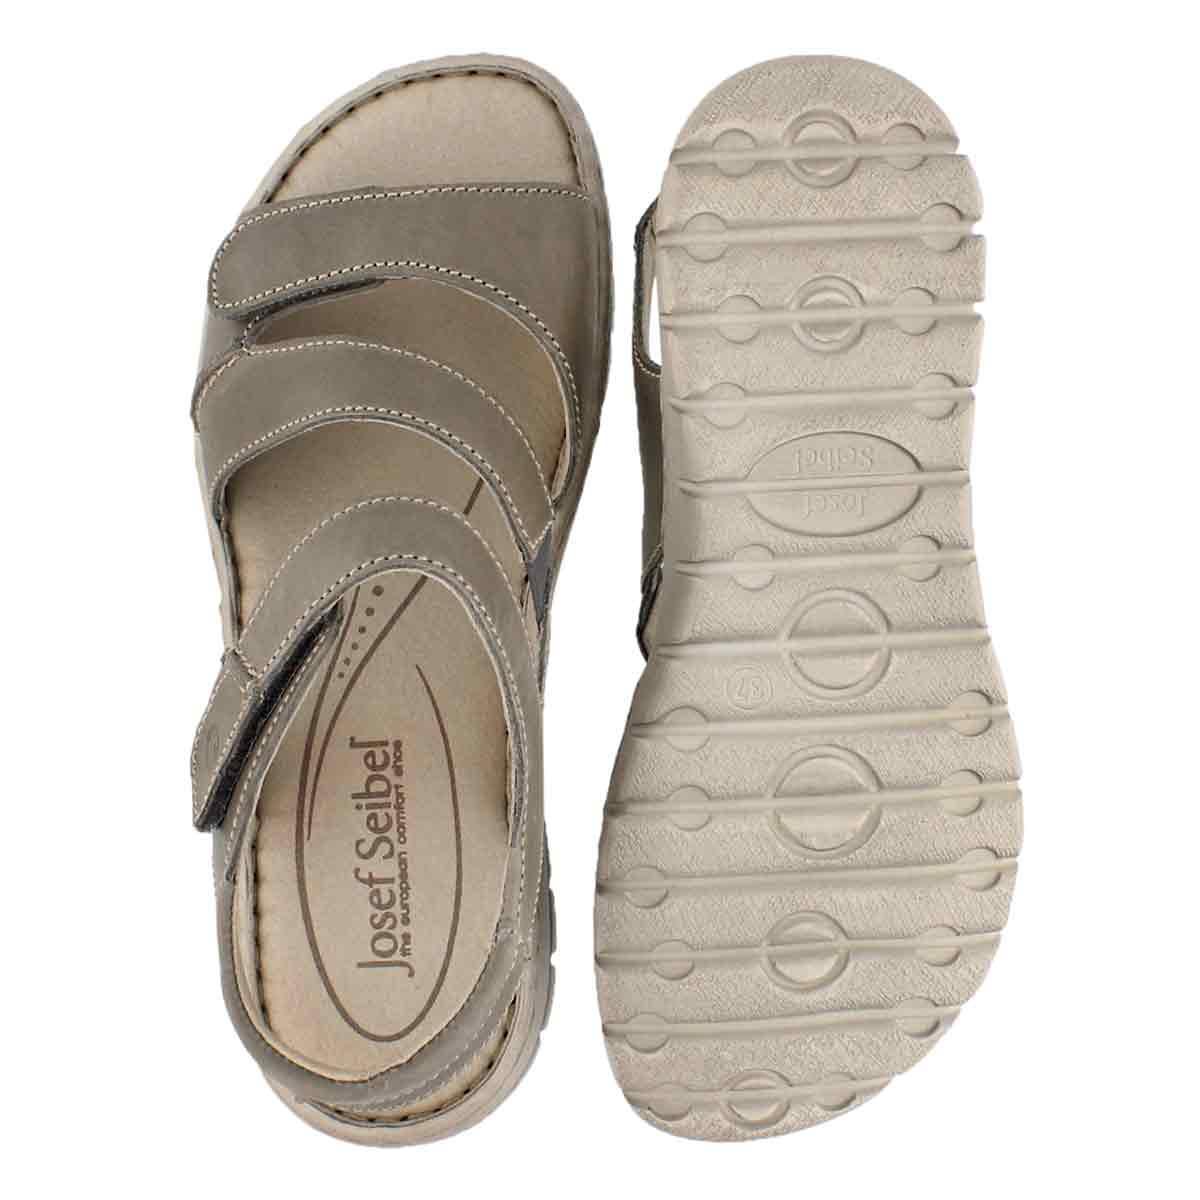 Lds Stefanie 31 asphalt casual sandal